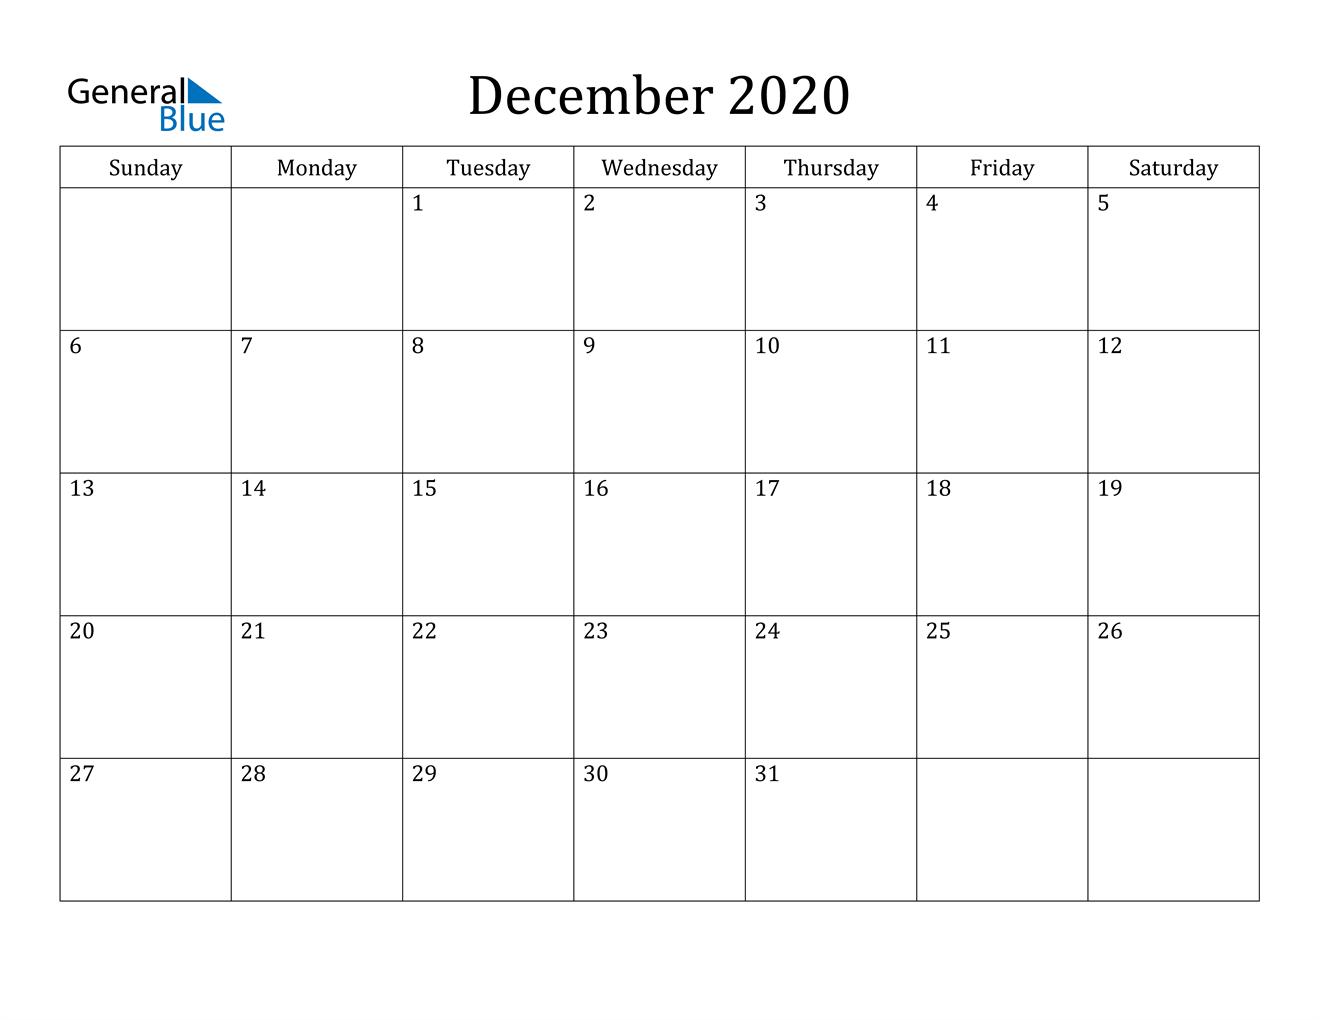 Image of December 2020 Classic Professional Calendar Calendar